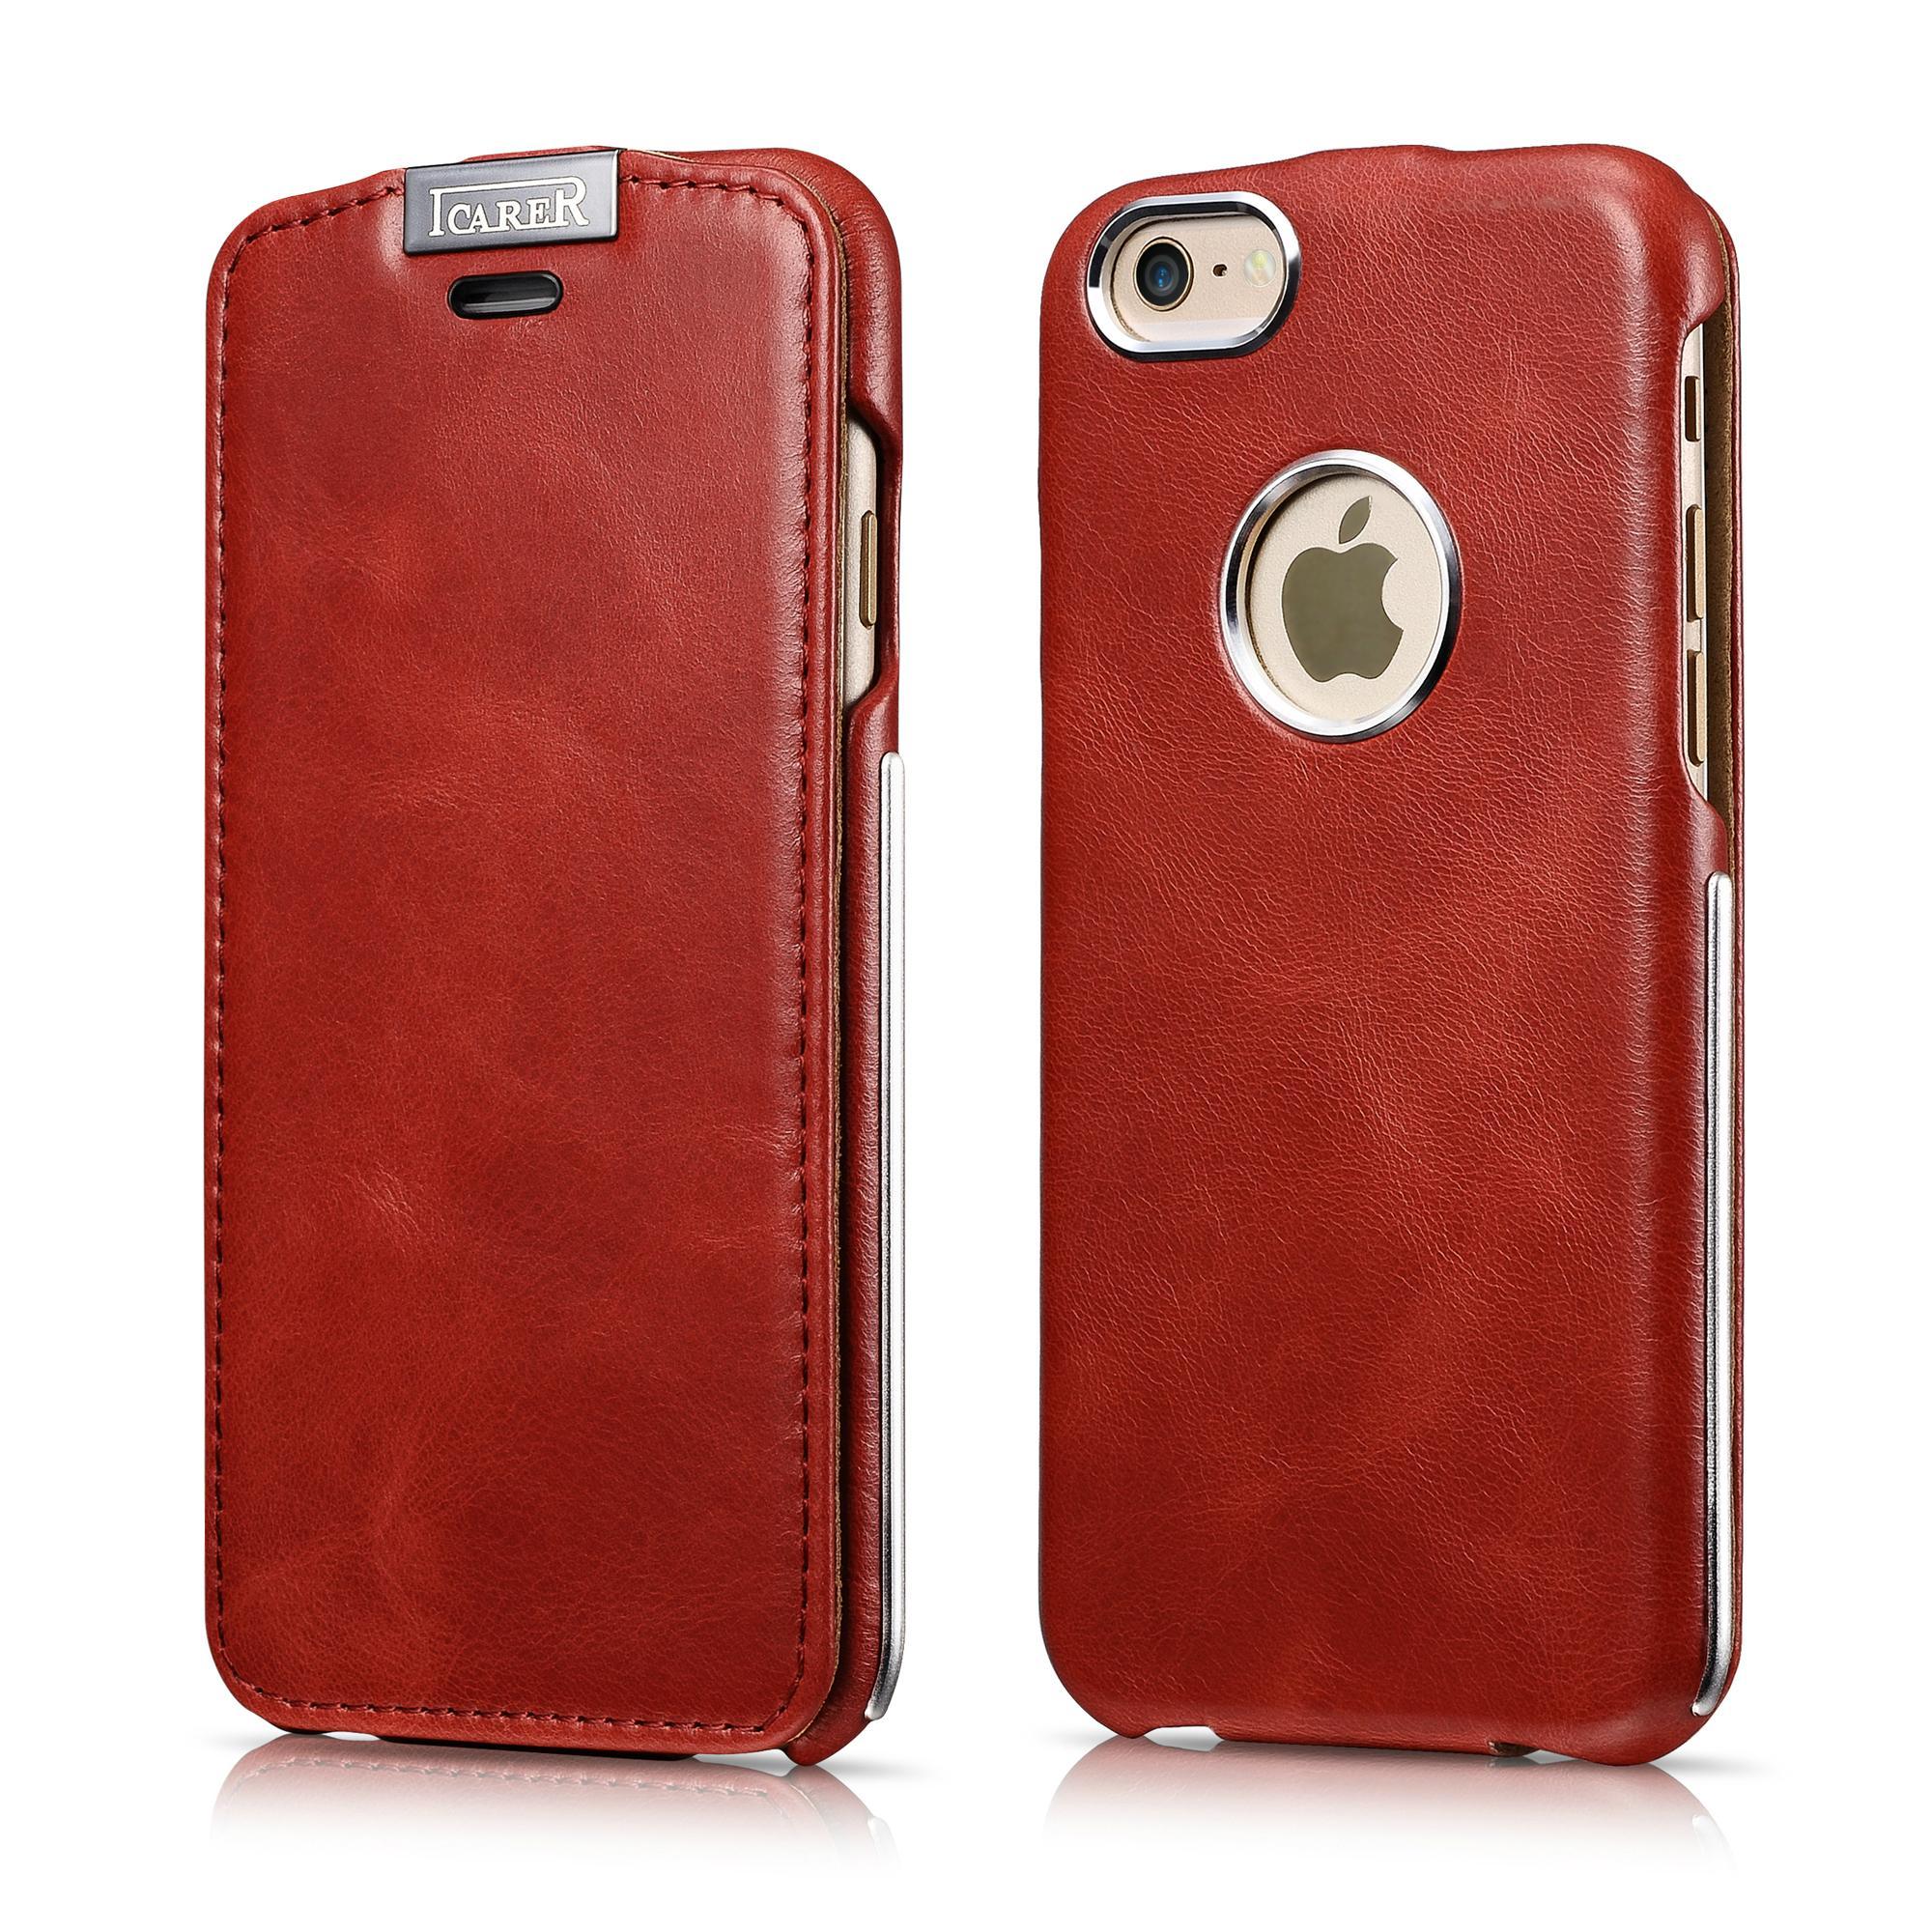 iCarer iPhone 6/6S Metal Warrior Vintage Series Magnetic Flip Leather Case 2